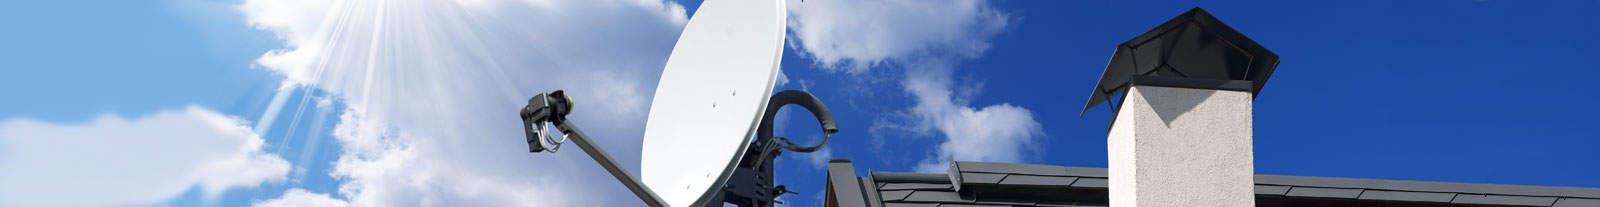 antenas-telecomunicaciones-grupo-lasser